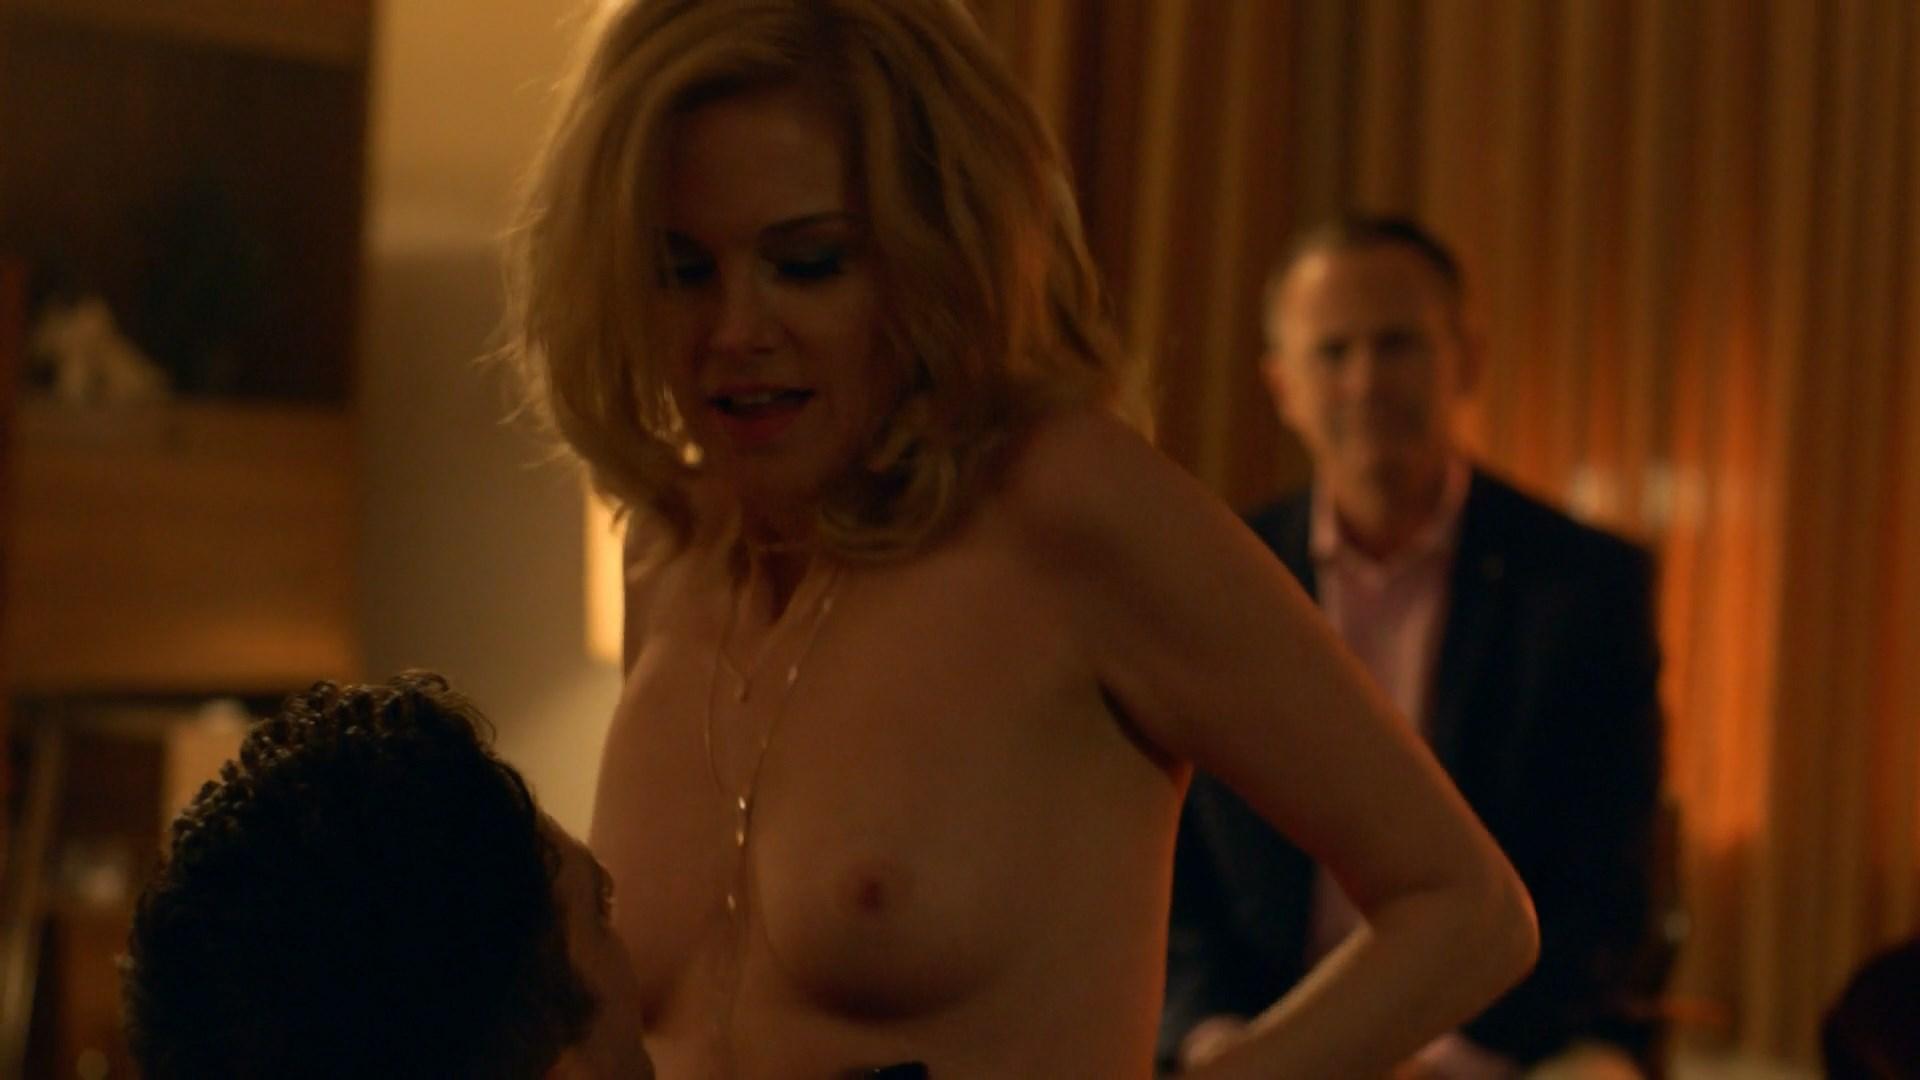 Cynthia Preston nude - Tom Clancy's Jack Ryan s01e03 (2018)